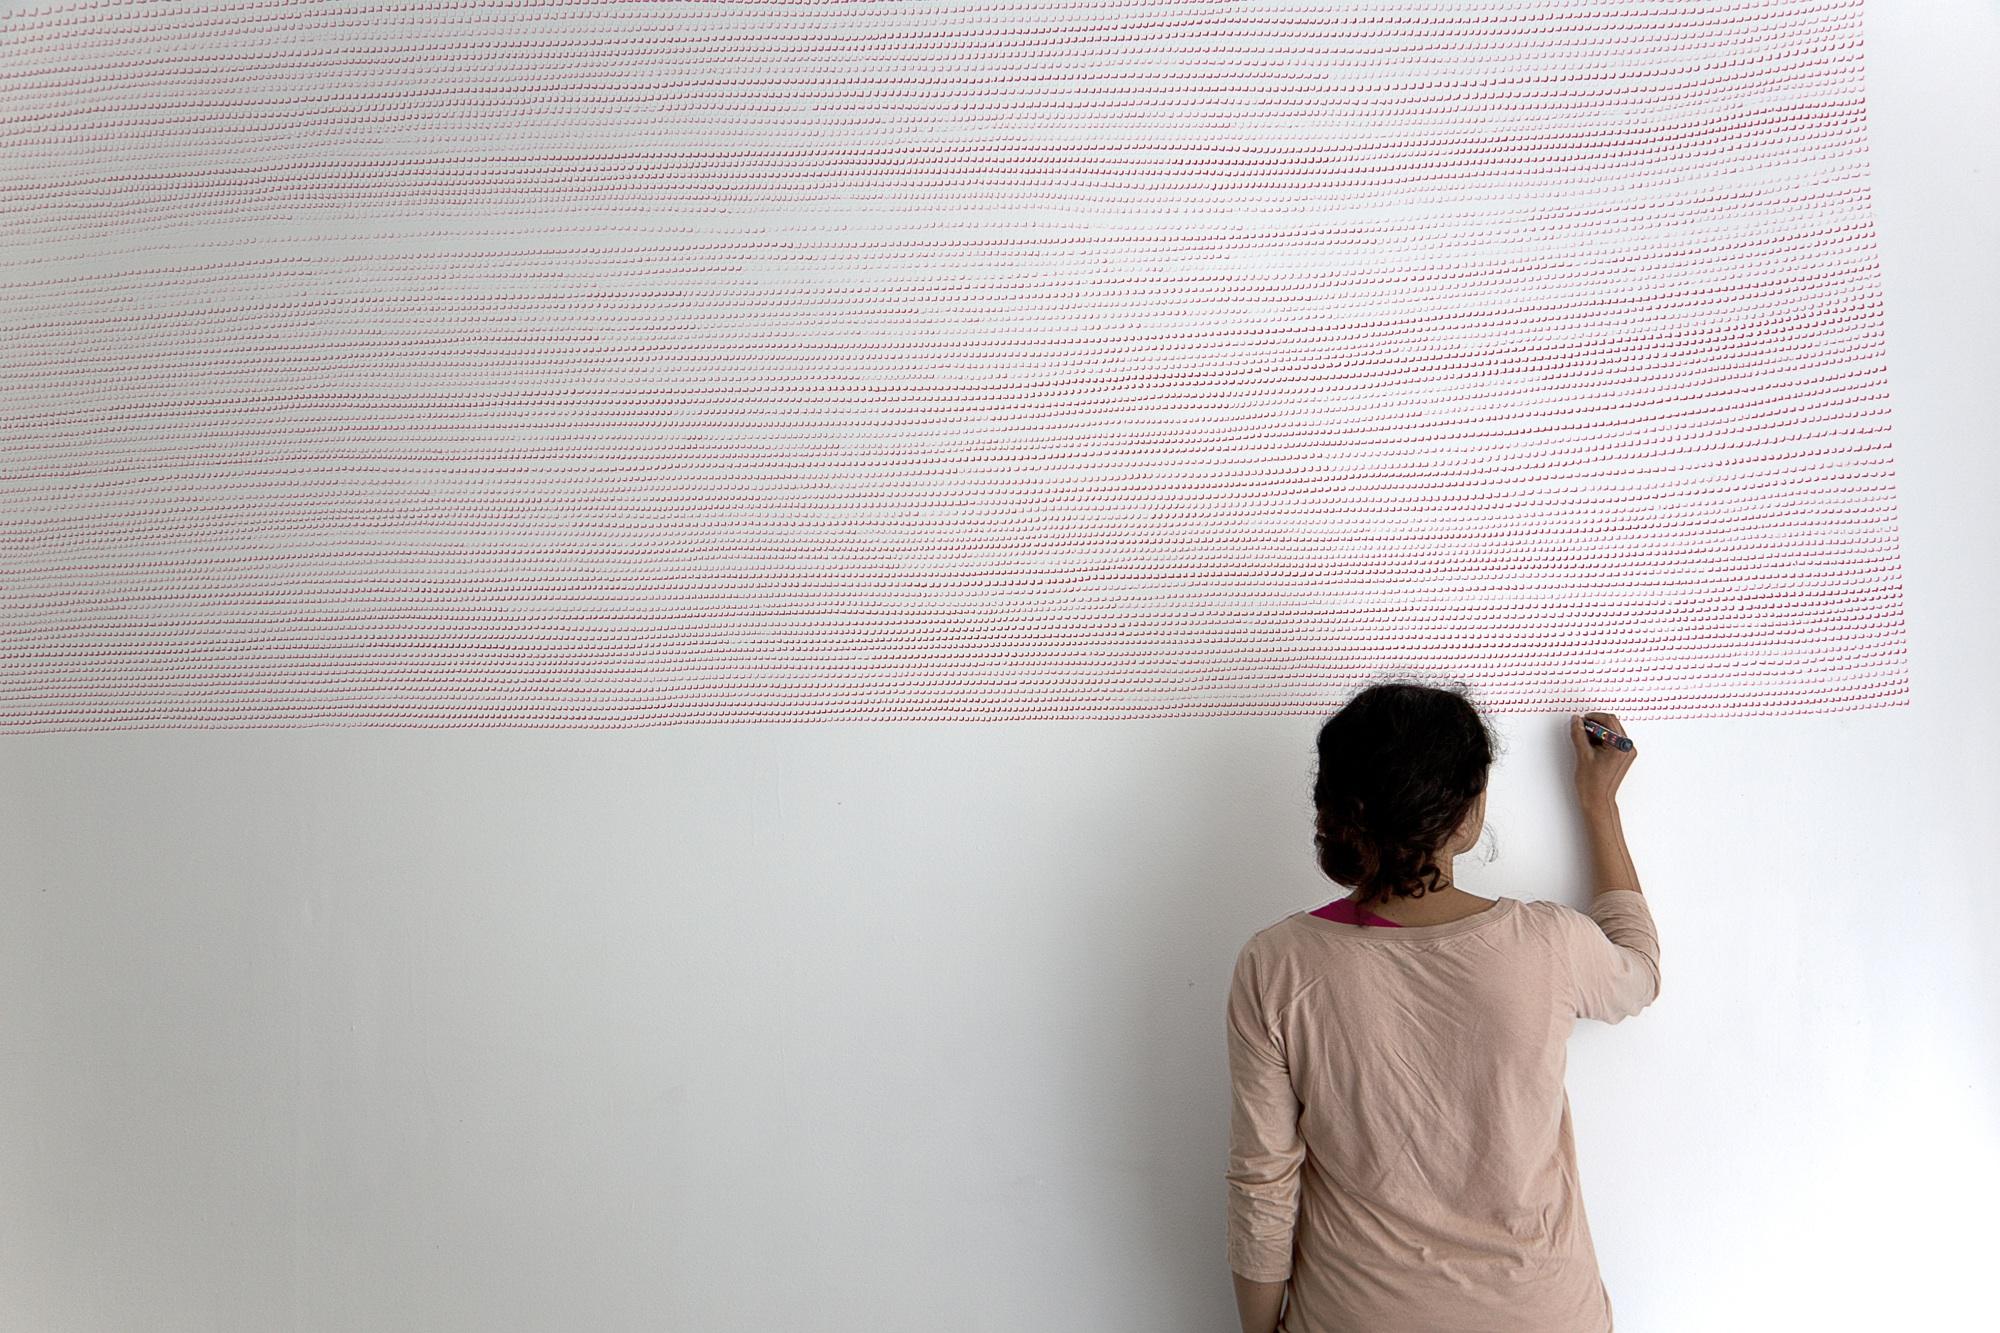 wall drawing N°4, 2011, acrylic pen on wall, 180 x 380 cm